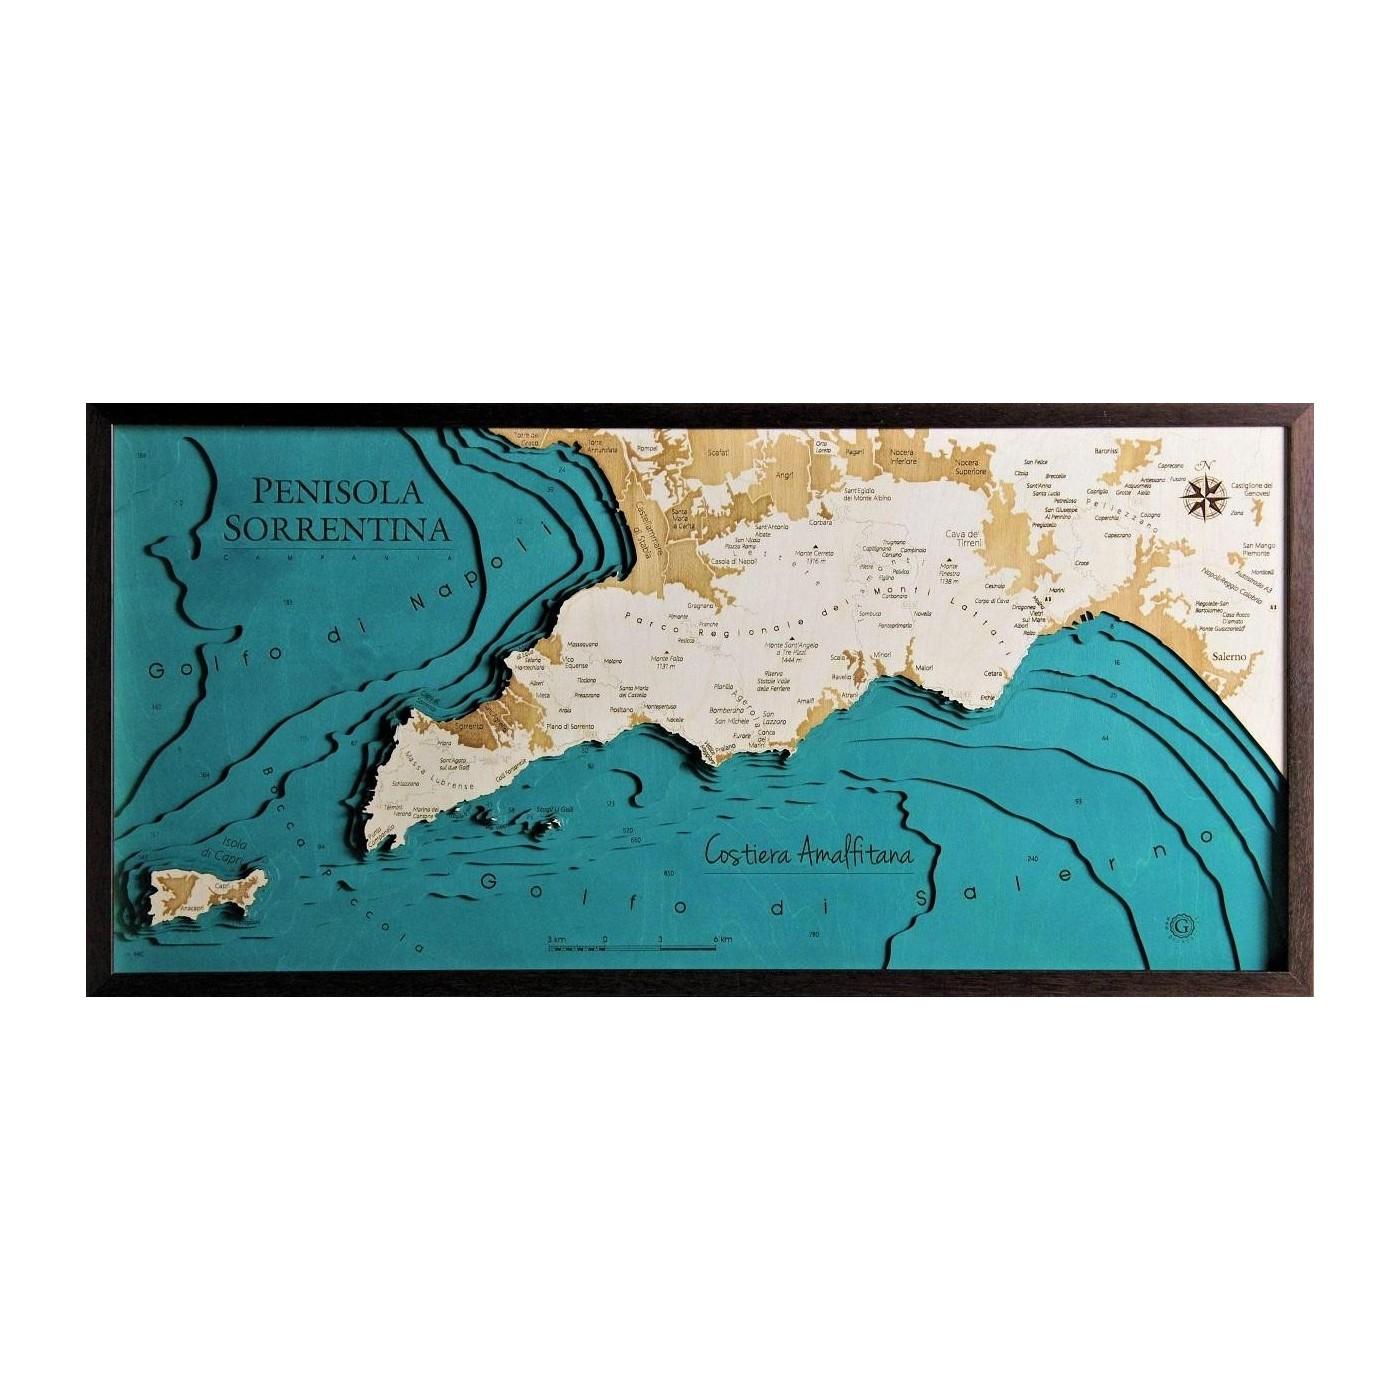 Cartina Costiera Amalfitana E Capri.Penisola Sorrentina Costiera Amalfitana